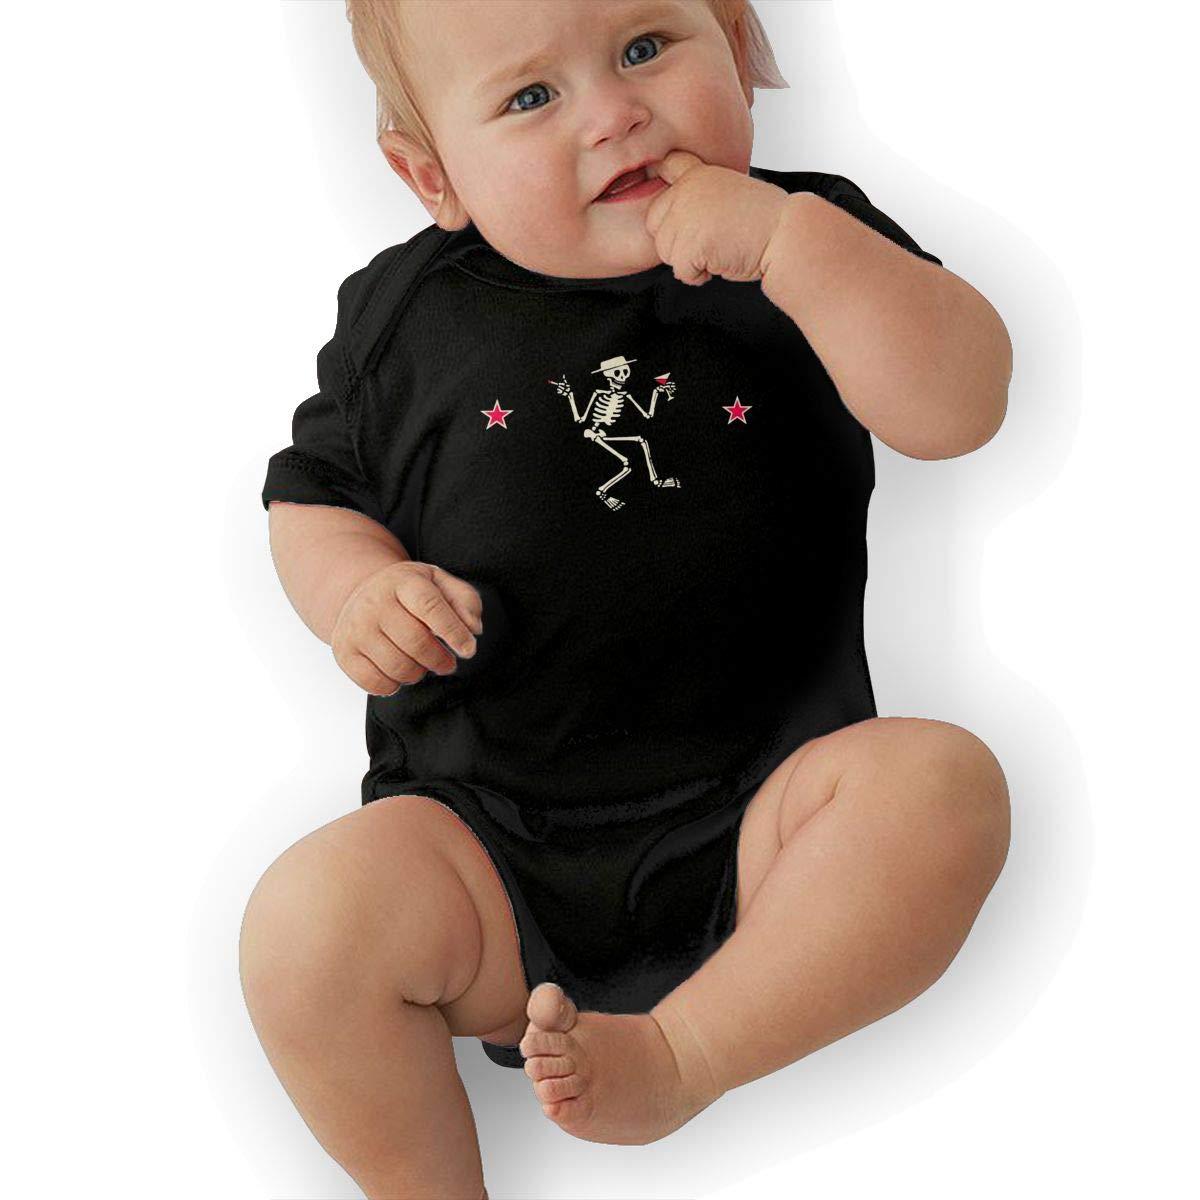 LuckyTagy Social Distortion Reach for The Sky Unisex Fashion Newborn Baby Romper Baby GirlJumpsuit Black